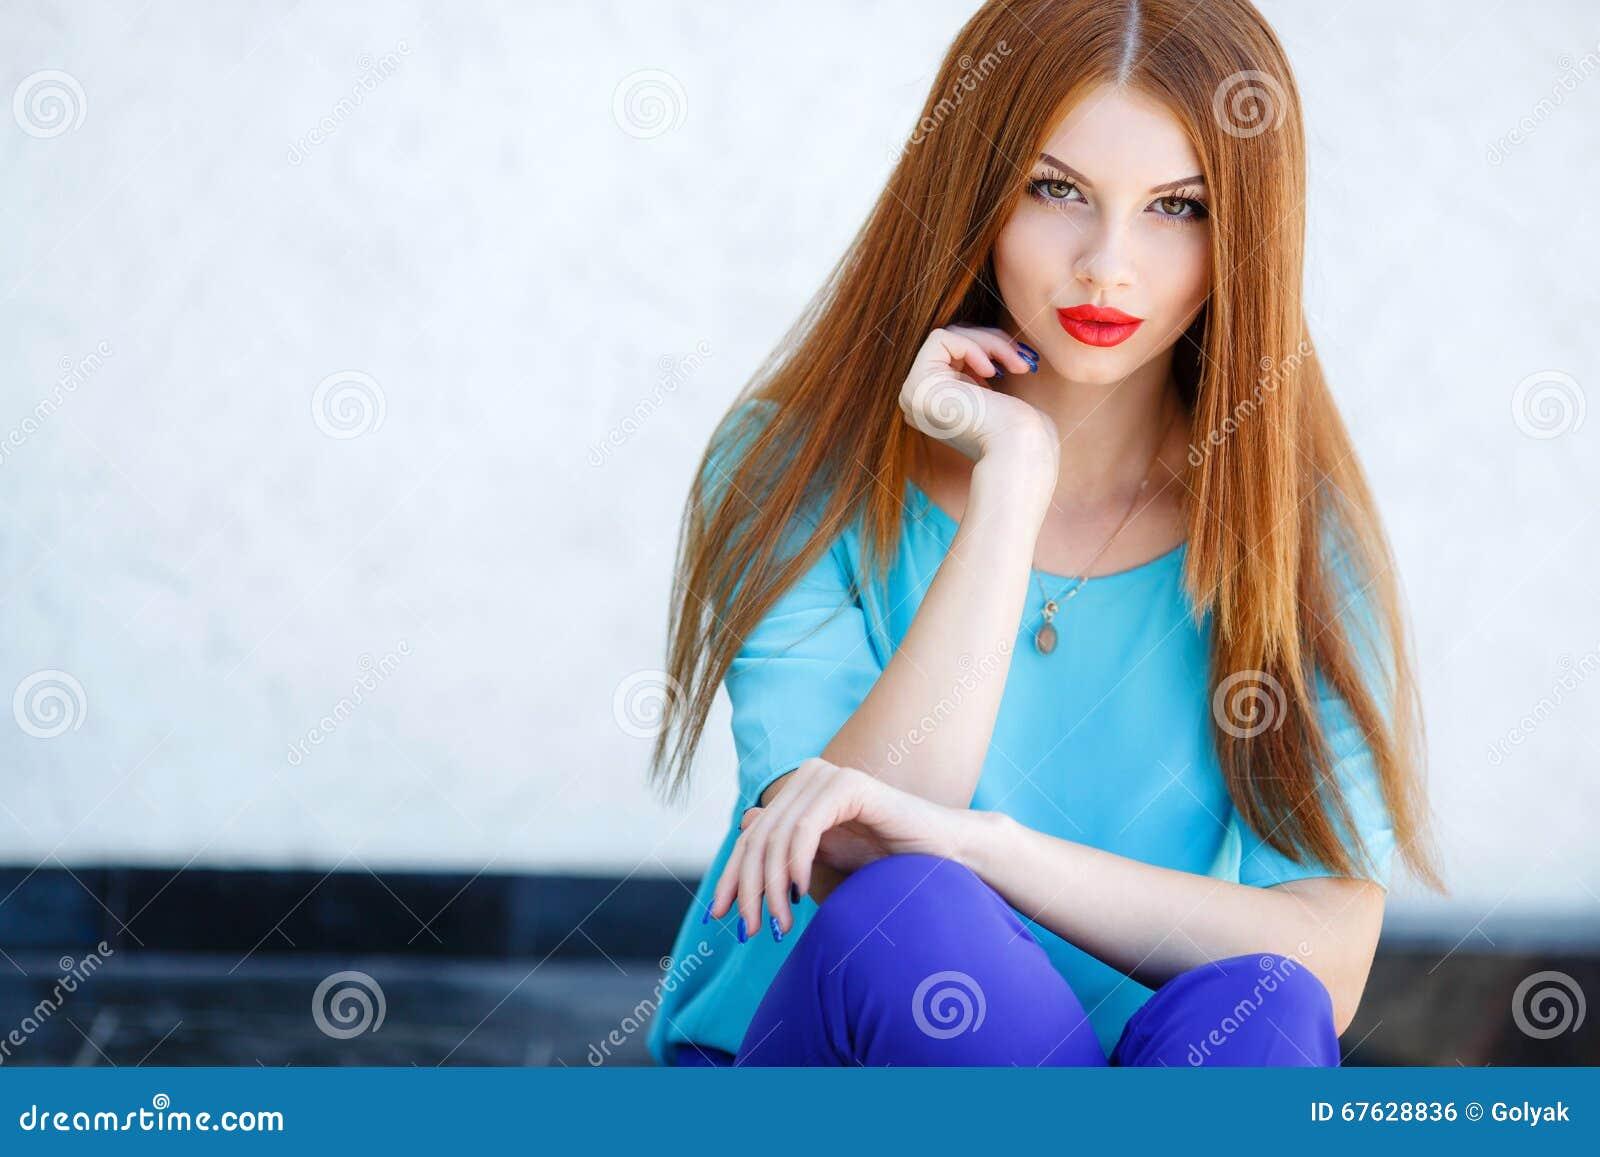 Red Lipstick Brown Hair Blue Eyes: Red Medallion Vector Illustration